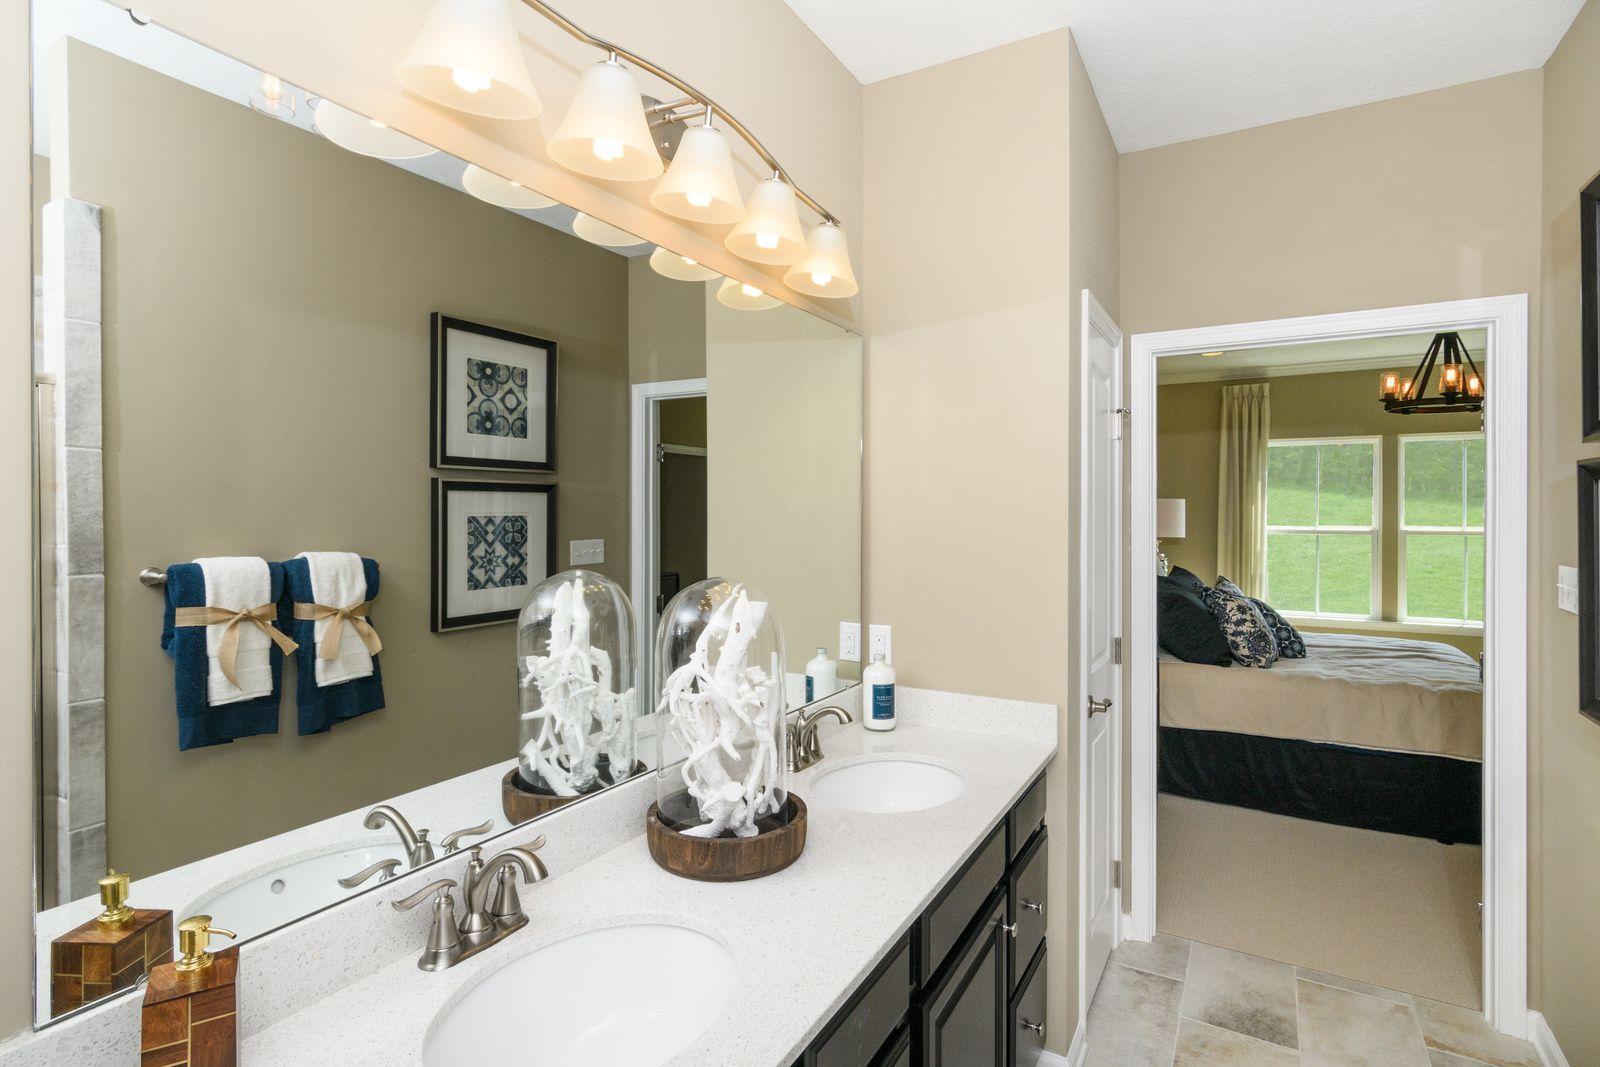 Bathroom-in-Pisa Torre-at-The Heights at Falling Water-in-Morgantown